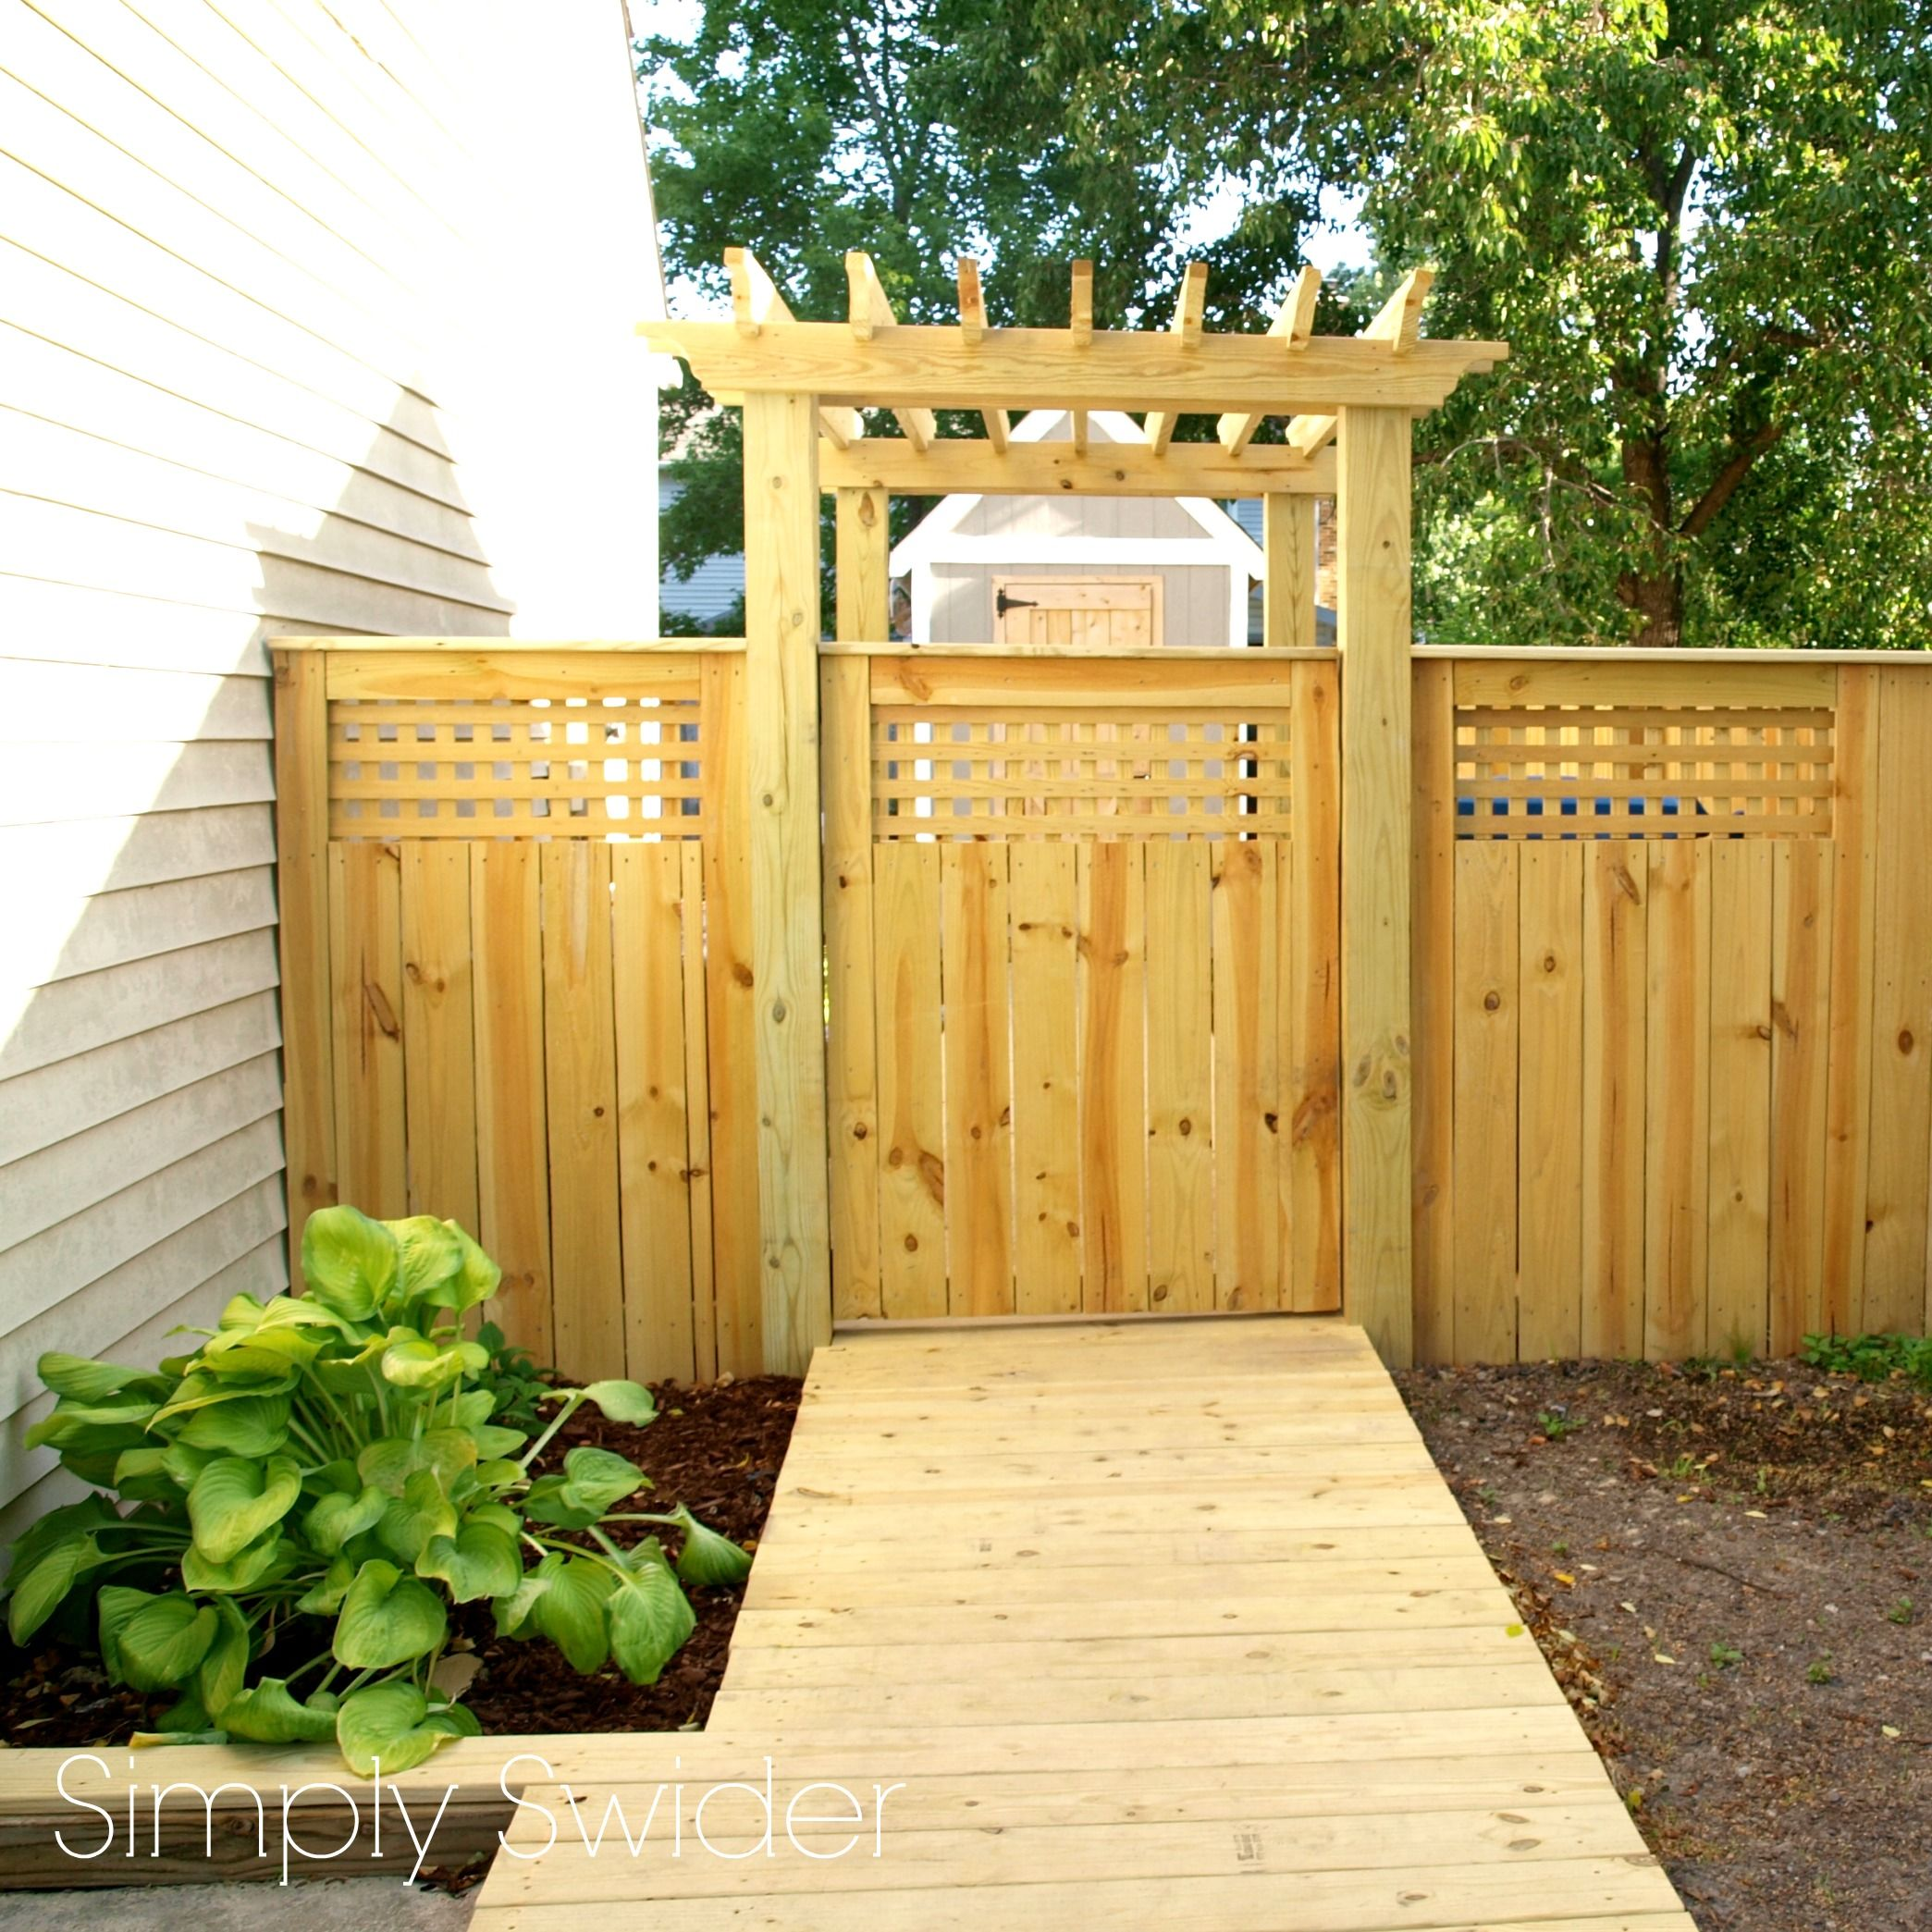 Fence Gate Arbor: EdP5271029.jpg (2089×2089)